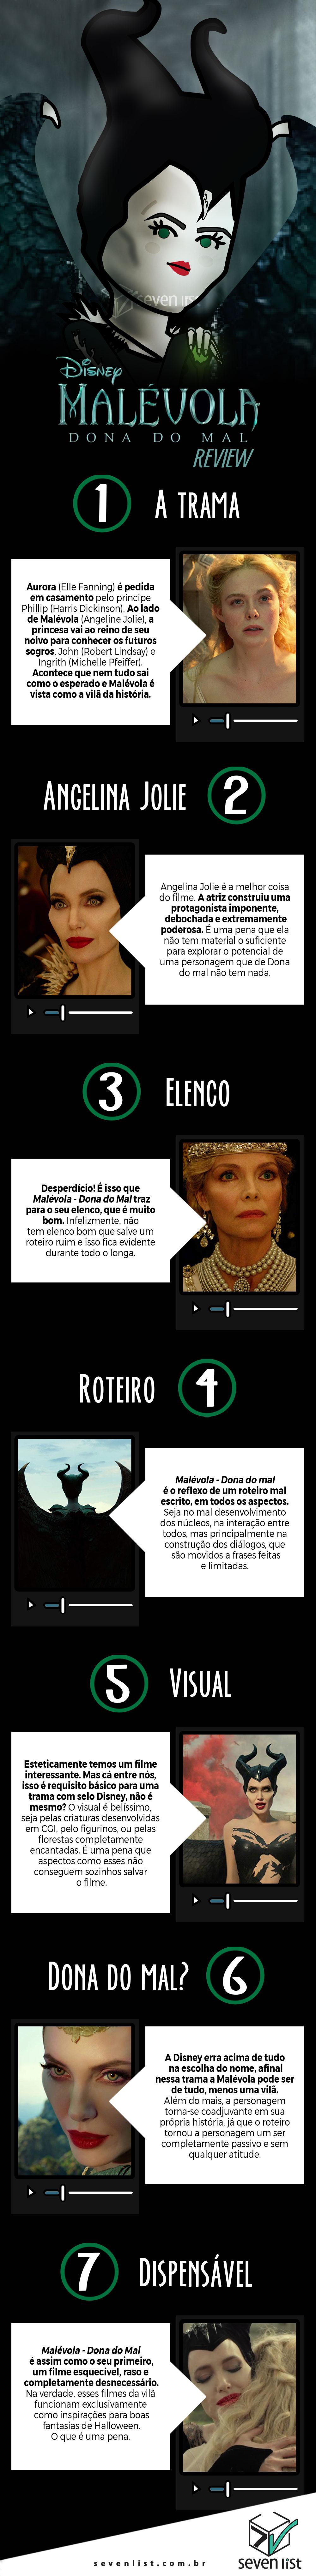 MALÉVOLA - DONA DO MAL - REVIEW - SEVEN LIST